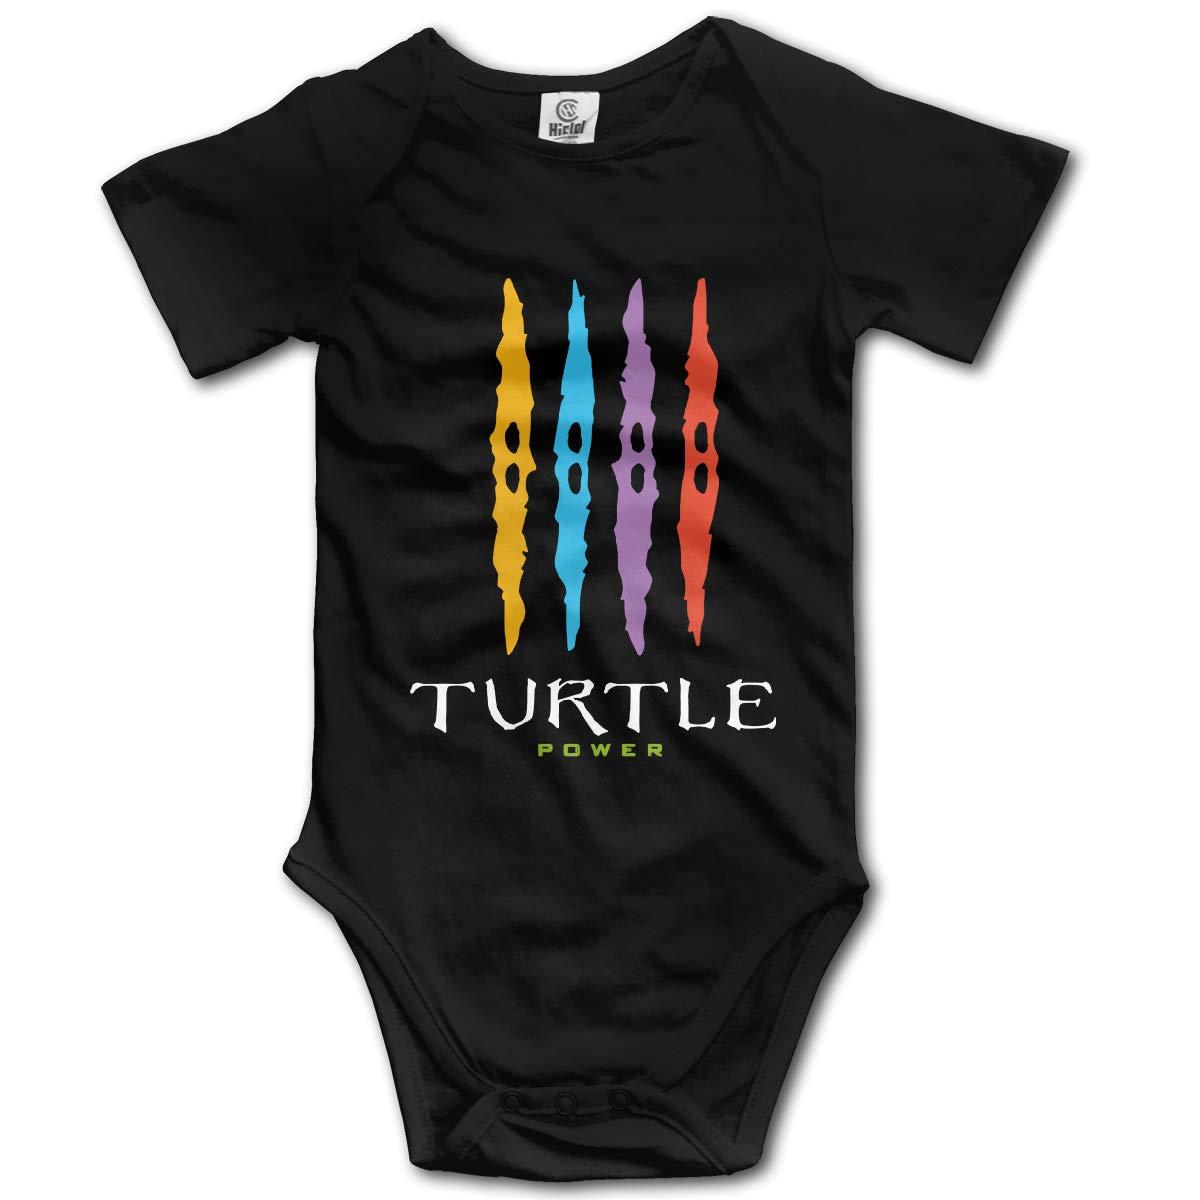 Turtle Power Baby Short Sleeve Romper Onesie Bodysuits for Toddler